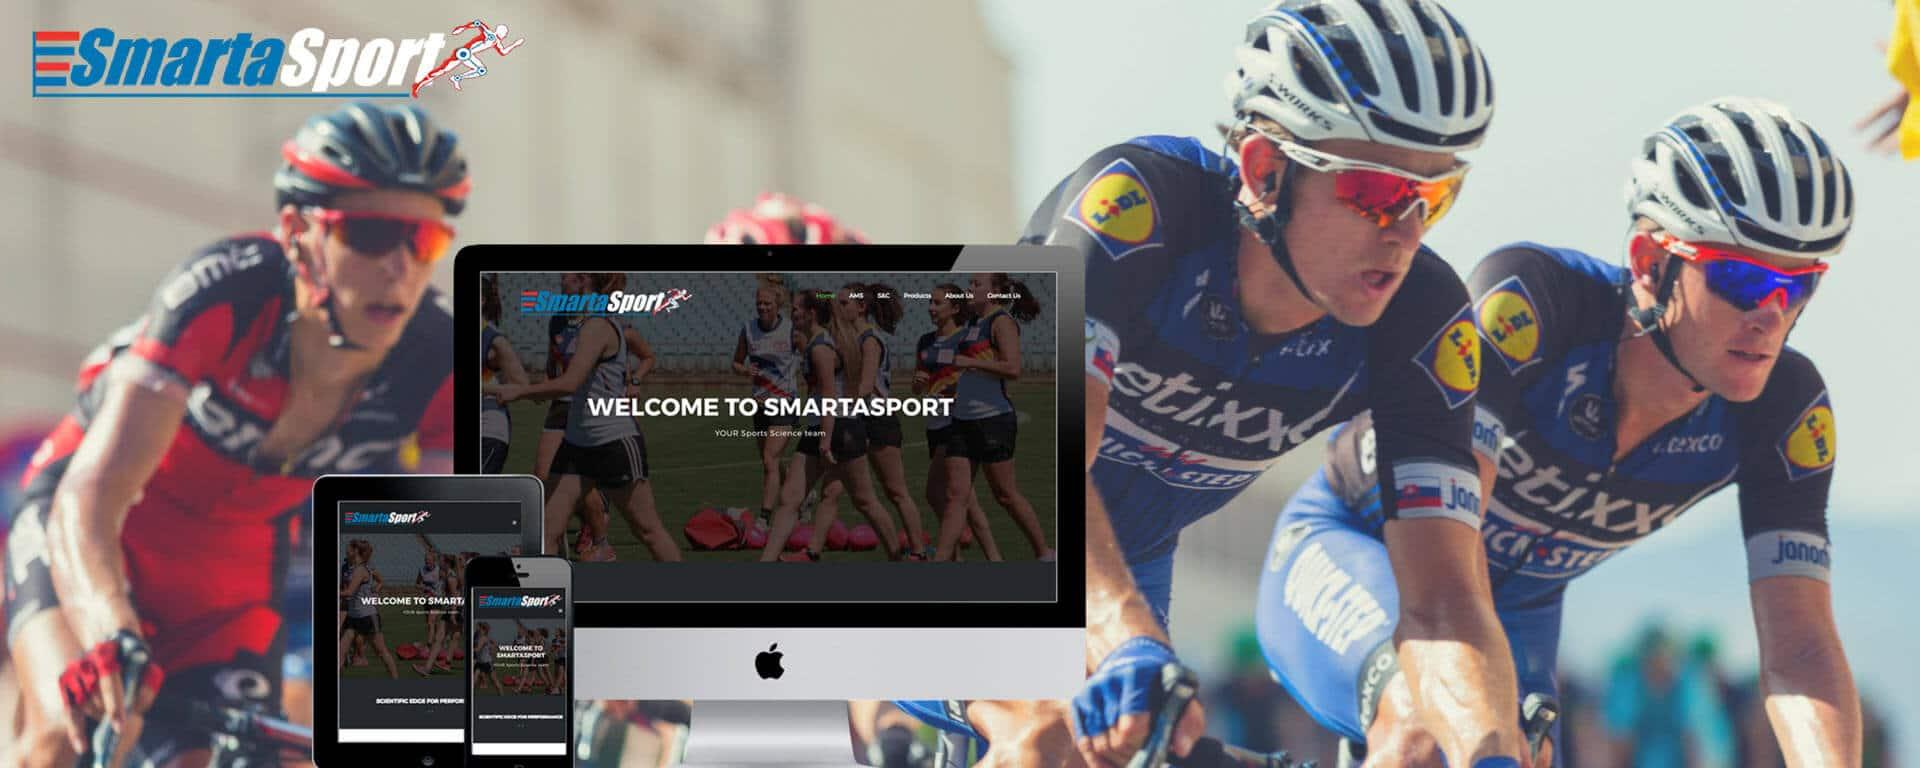 smartasport-1.jpg